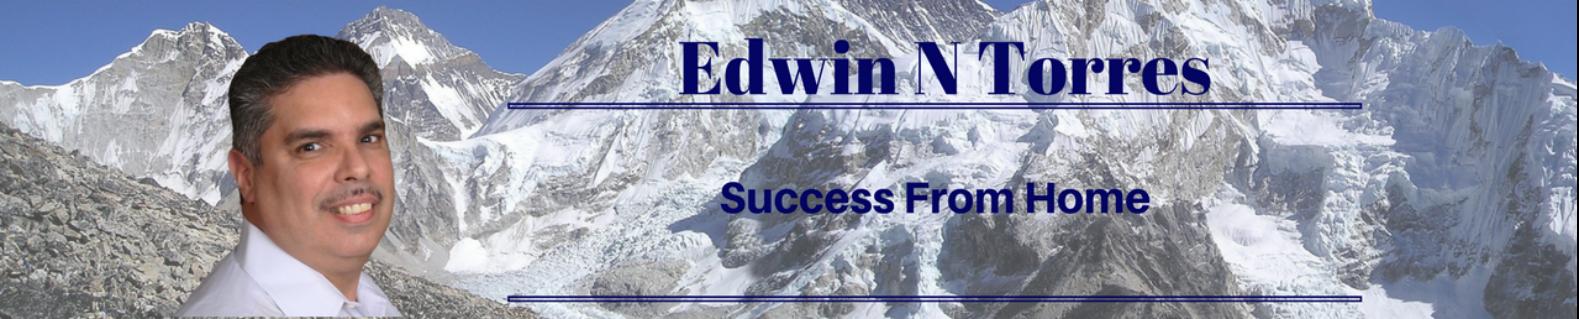 Edwin N Torres